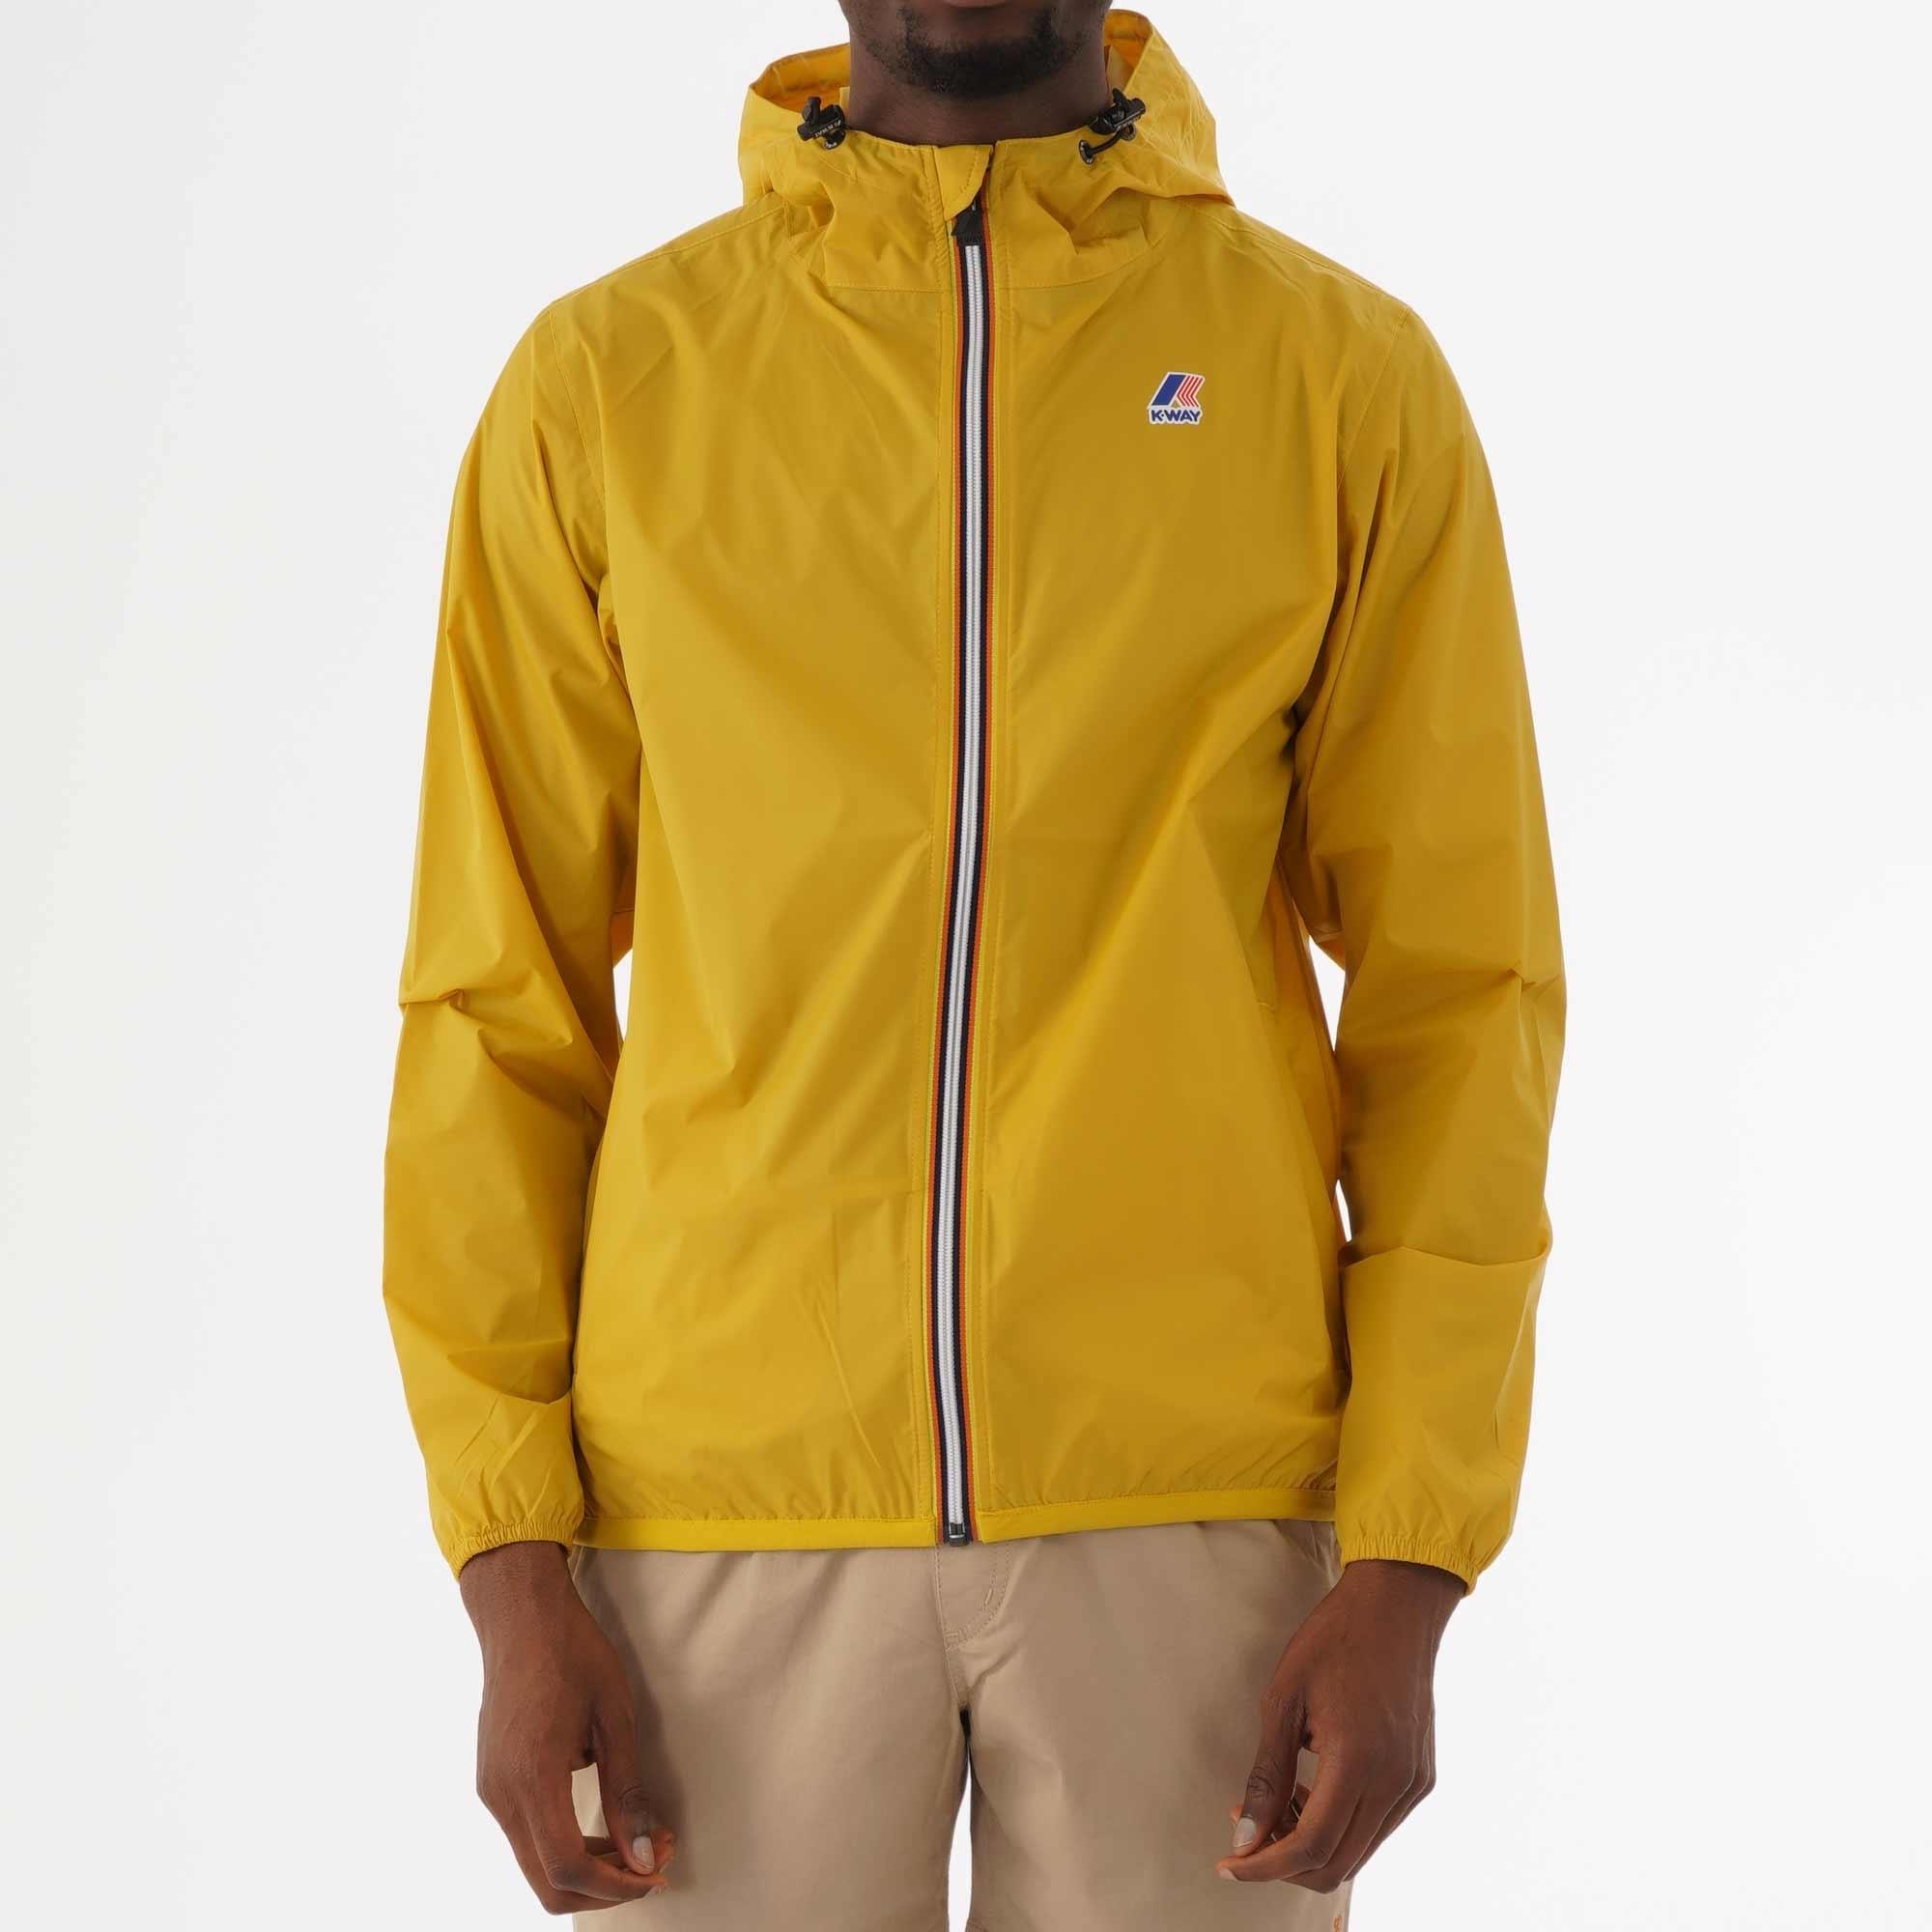 quality design 29c7f 1df08 K-Way K-Way Le vrai Claude 3.0 Yellow Mustard Jacket